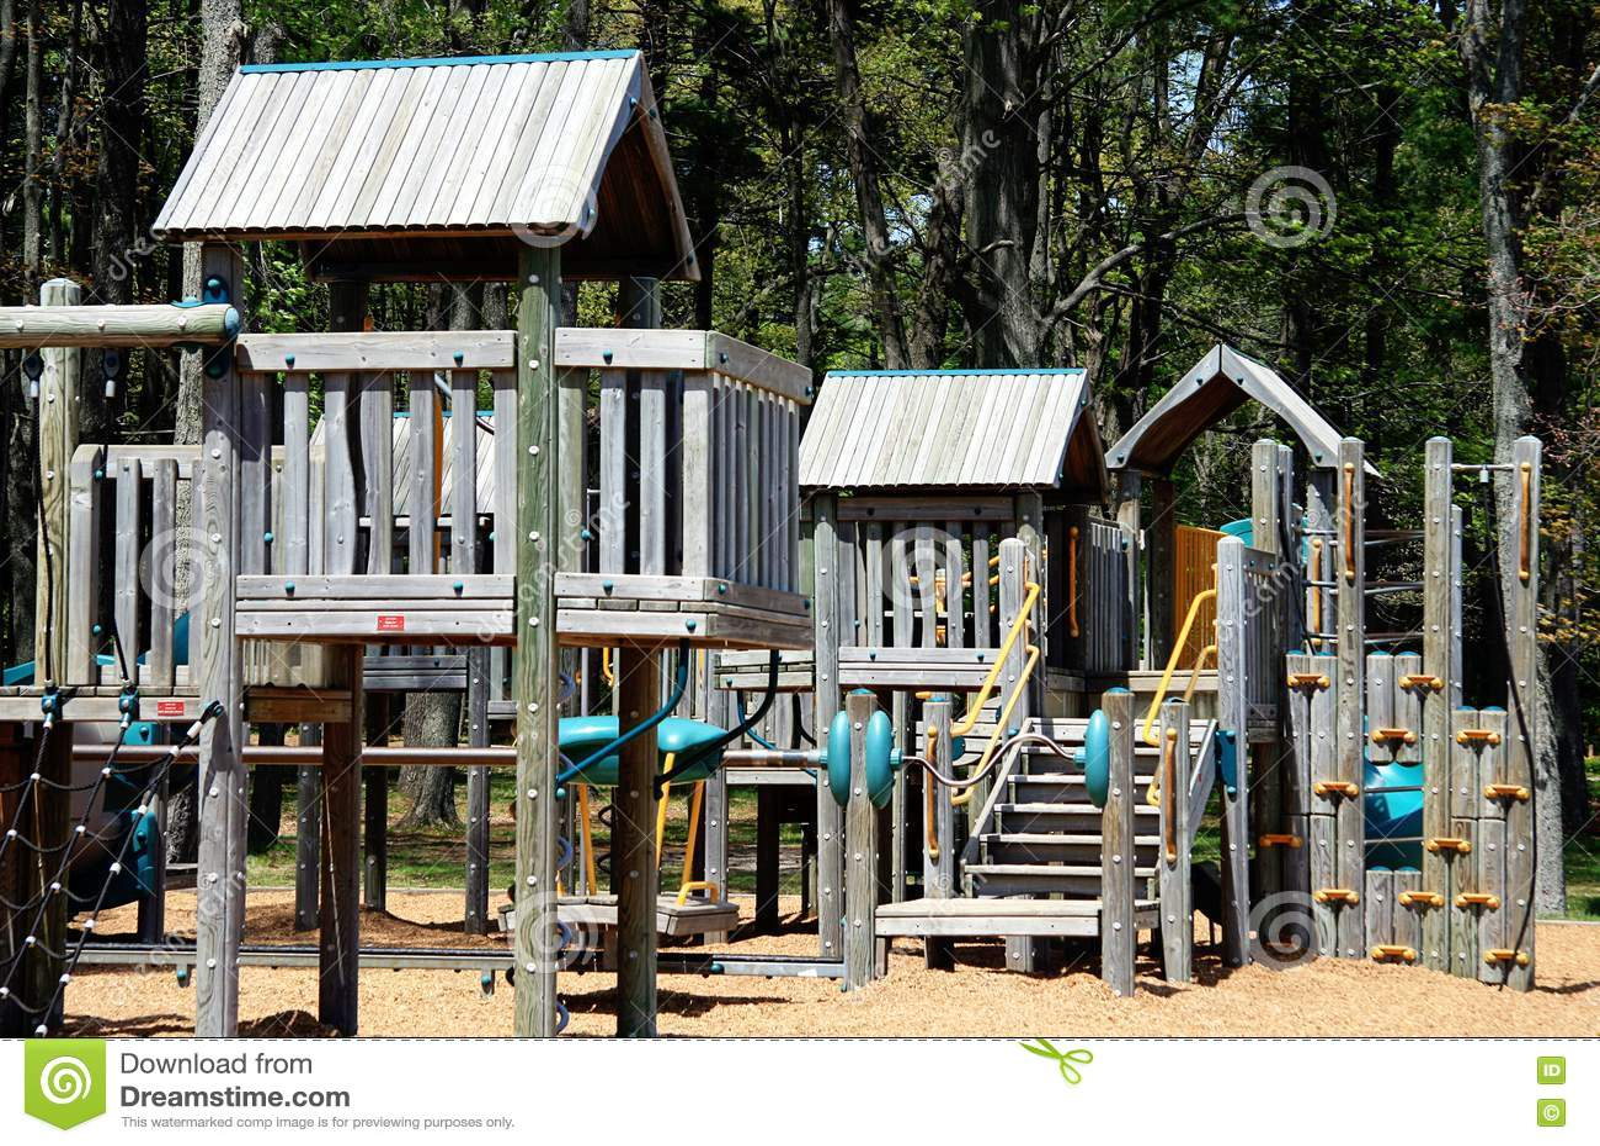 Wooden Playground Equipment Stock Image Image 14461921